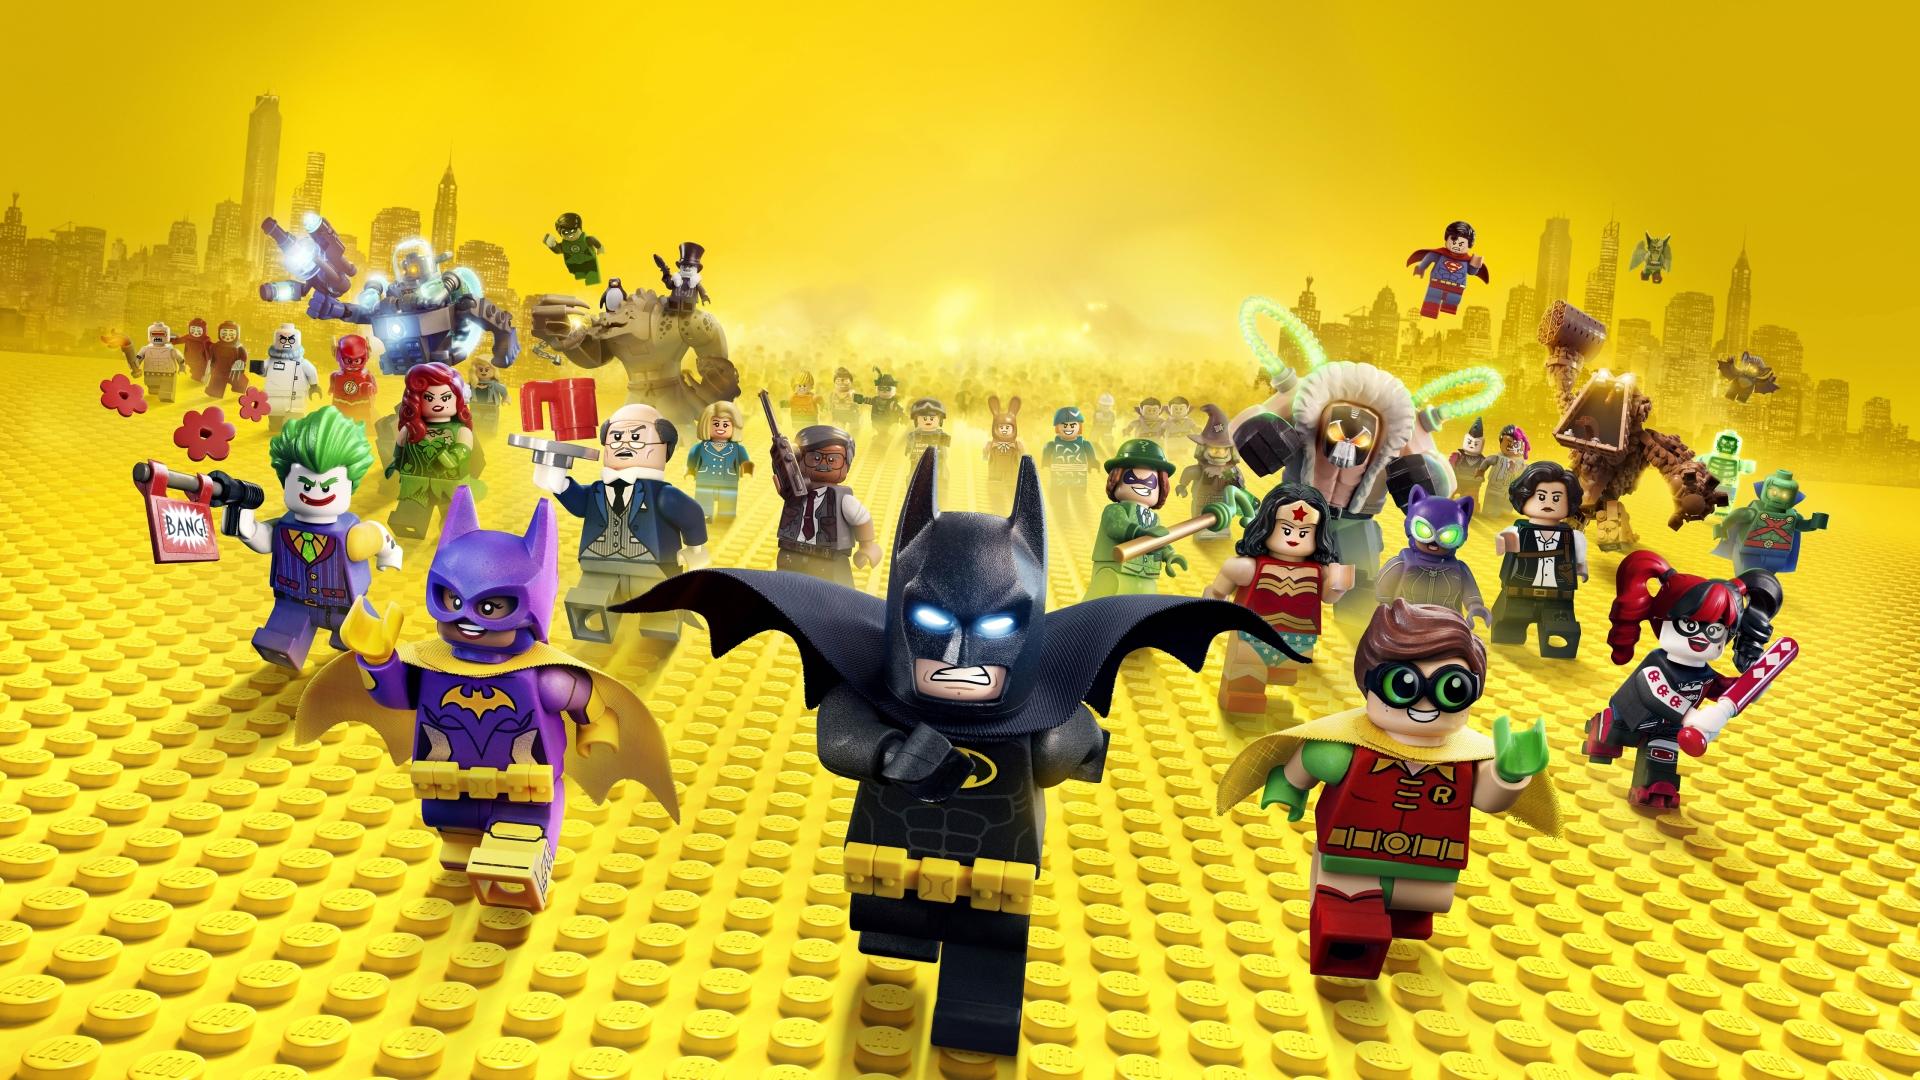 Batman Birthday Invitations Auto Electrical Wiring Diagram Acura Tl 32751 Sep A020 Fondos De Pantalla La Lego Pelicula Wallpapers